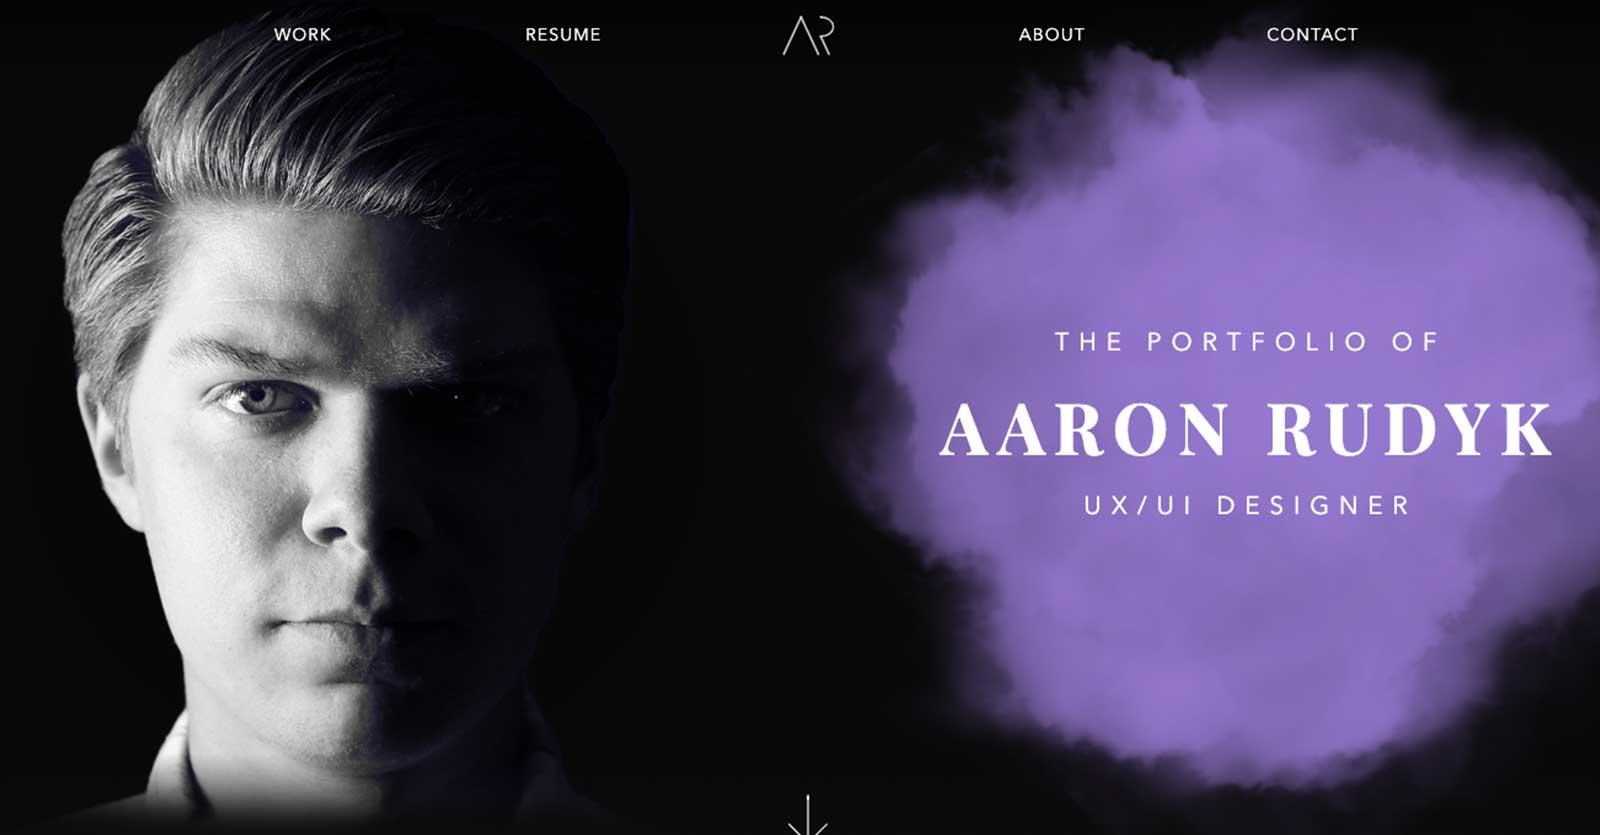 aaron rudyk's portfolio